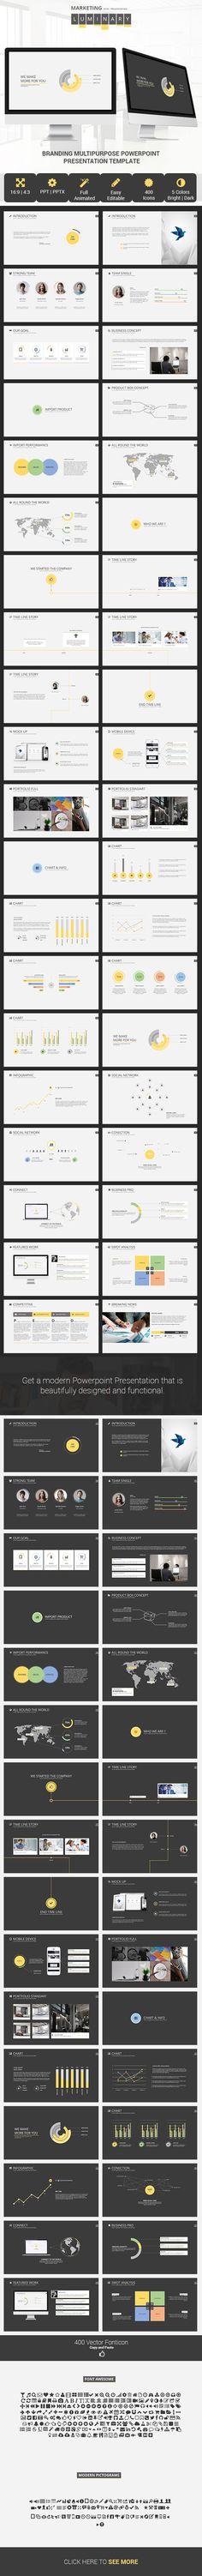 sample business plan powerpoint presentation